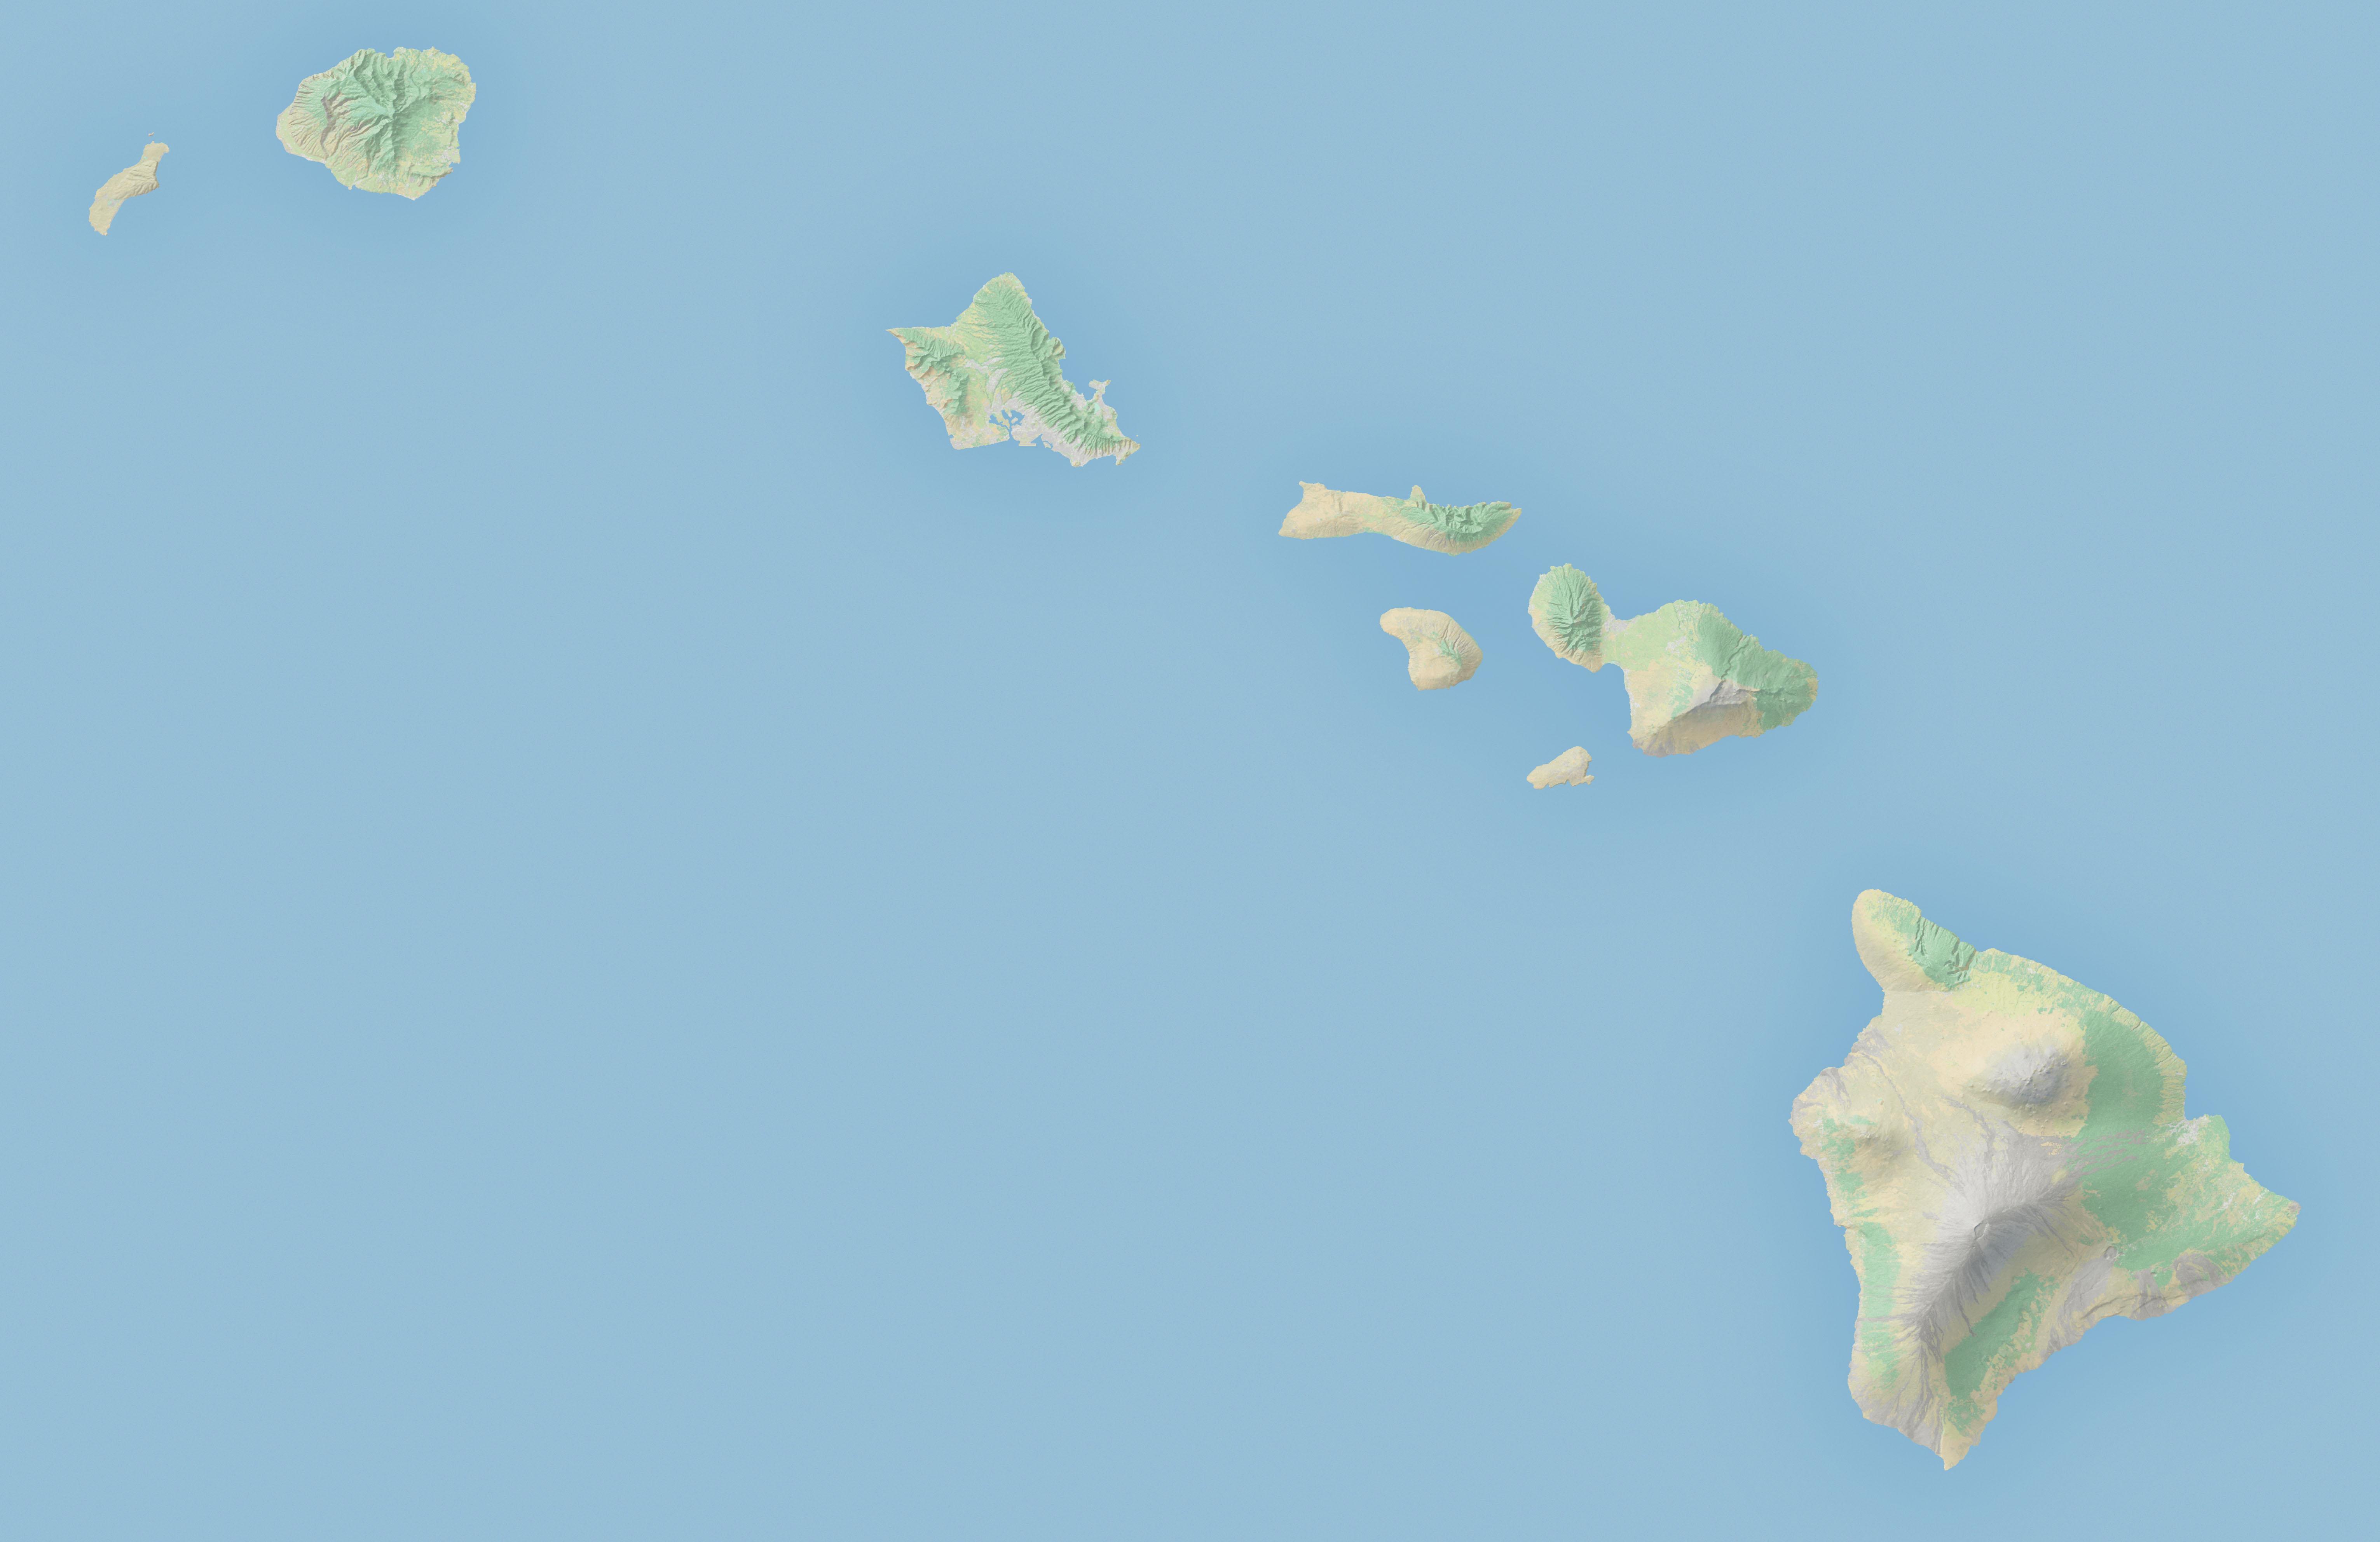 Hawaii Map Vector At Getdrawings Com Free For Personal Use Hawaii